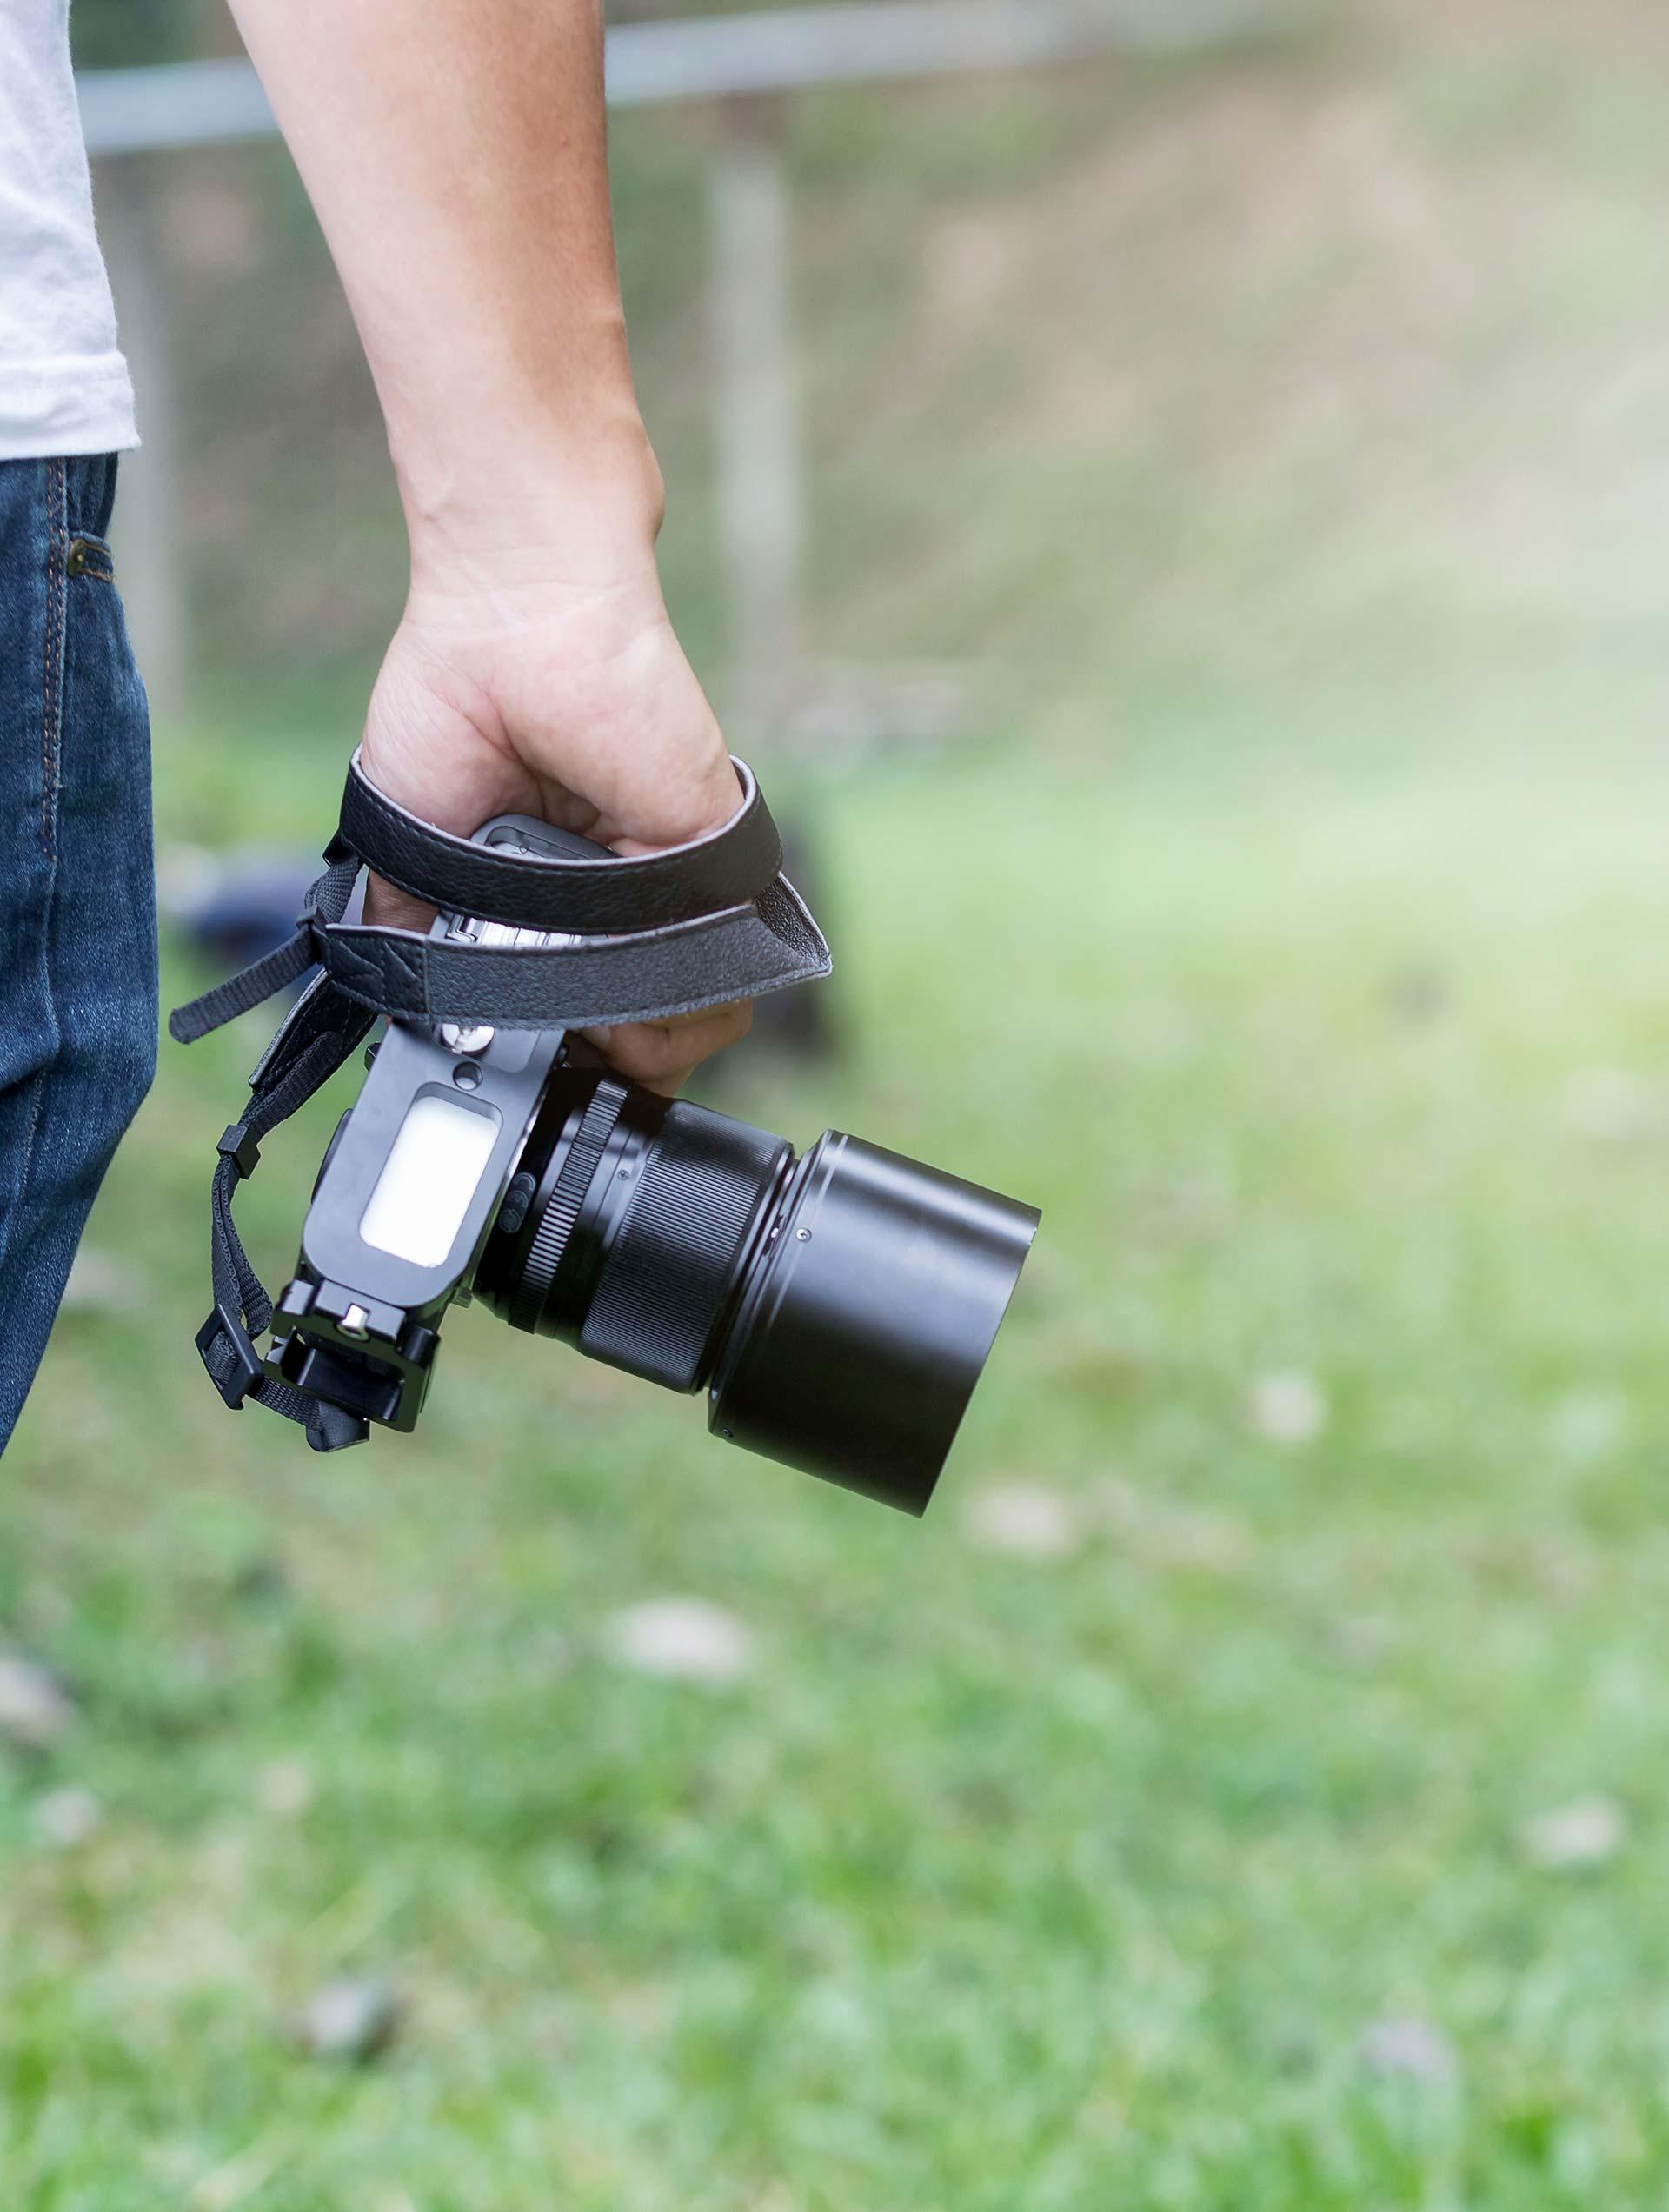 curso de fotoperiodismo